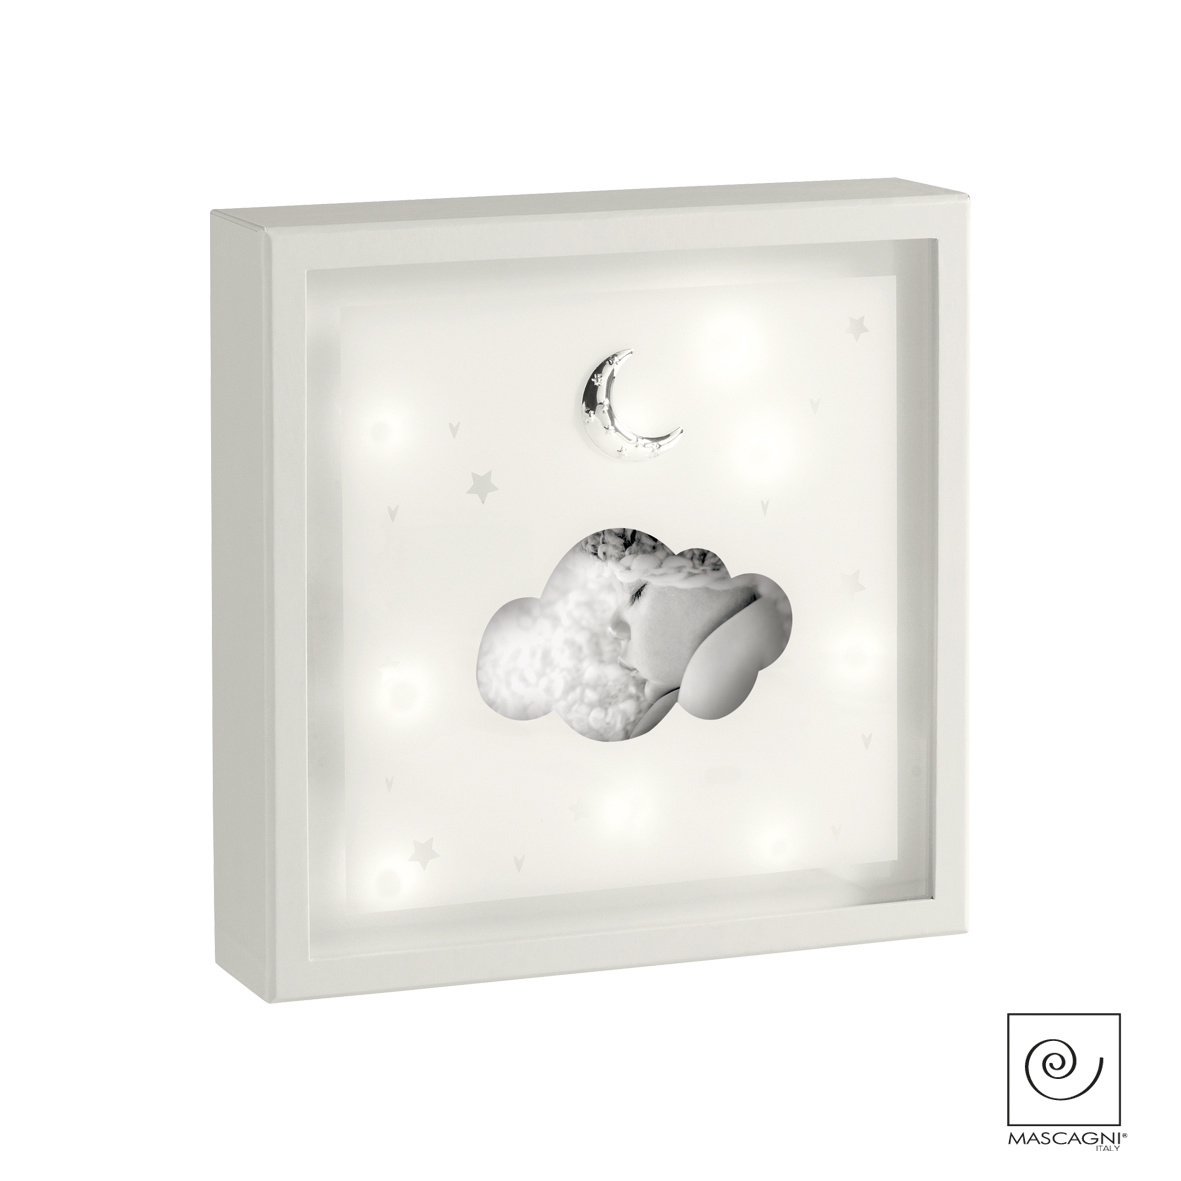 Art Mascagni A814 PHOTO FRAME LED 23X23 - COL.IVORY